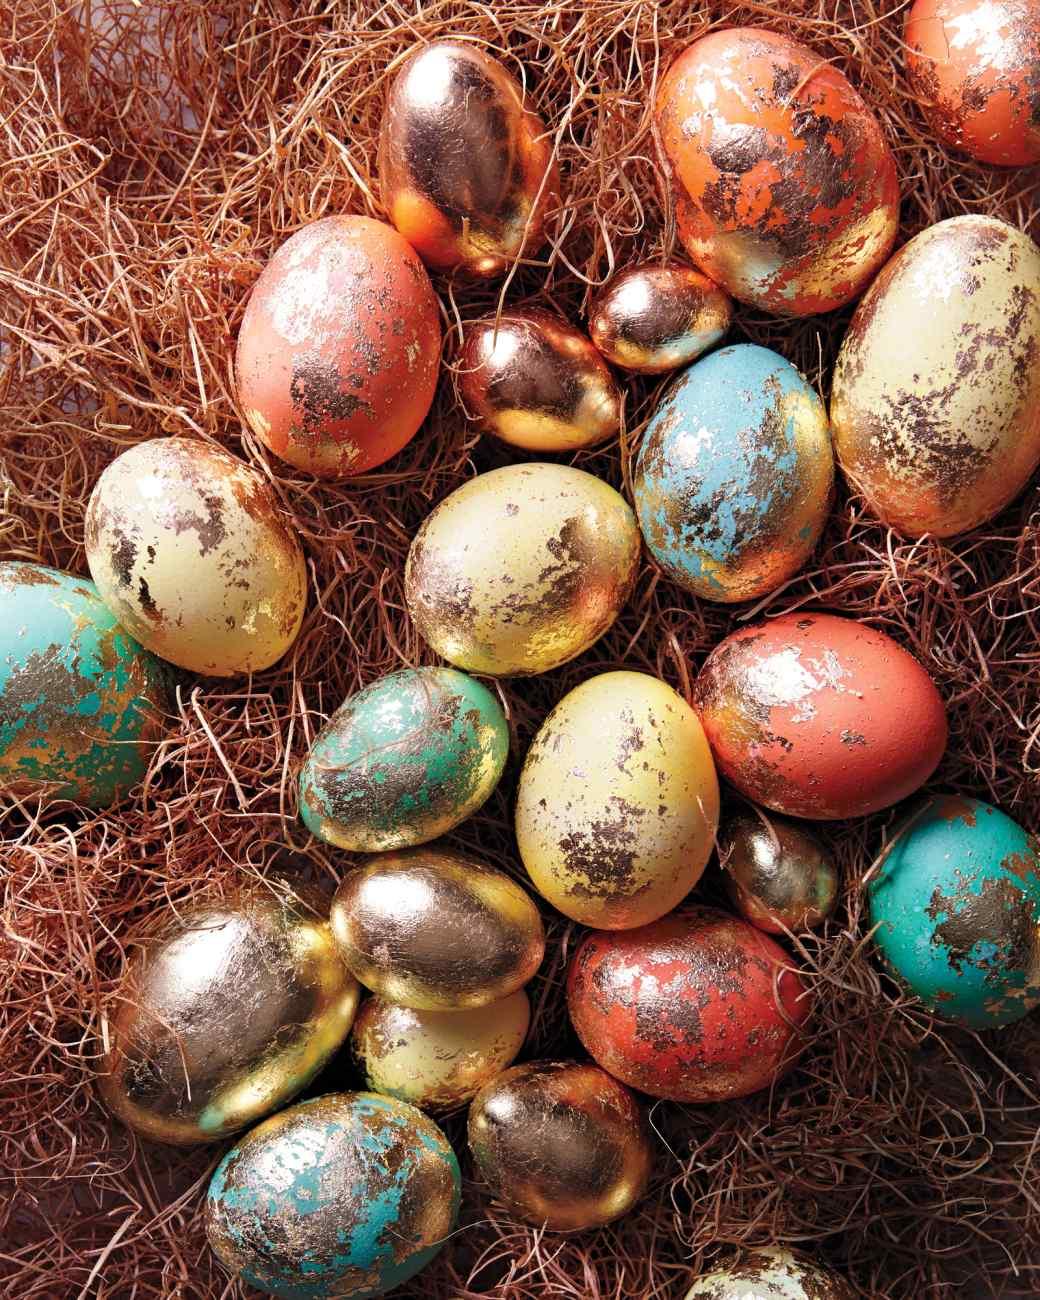 eggs-in-nests-115-exp-1-mld110852_vert.jpg